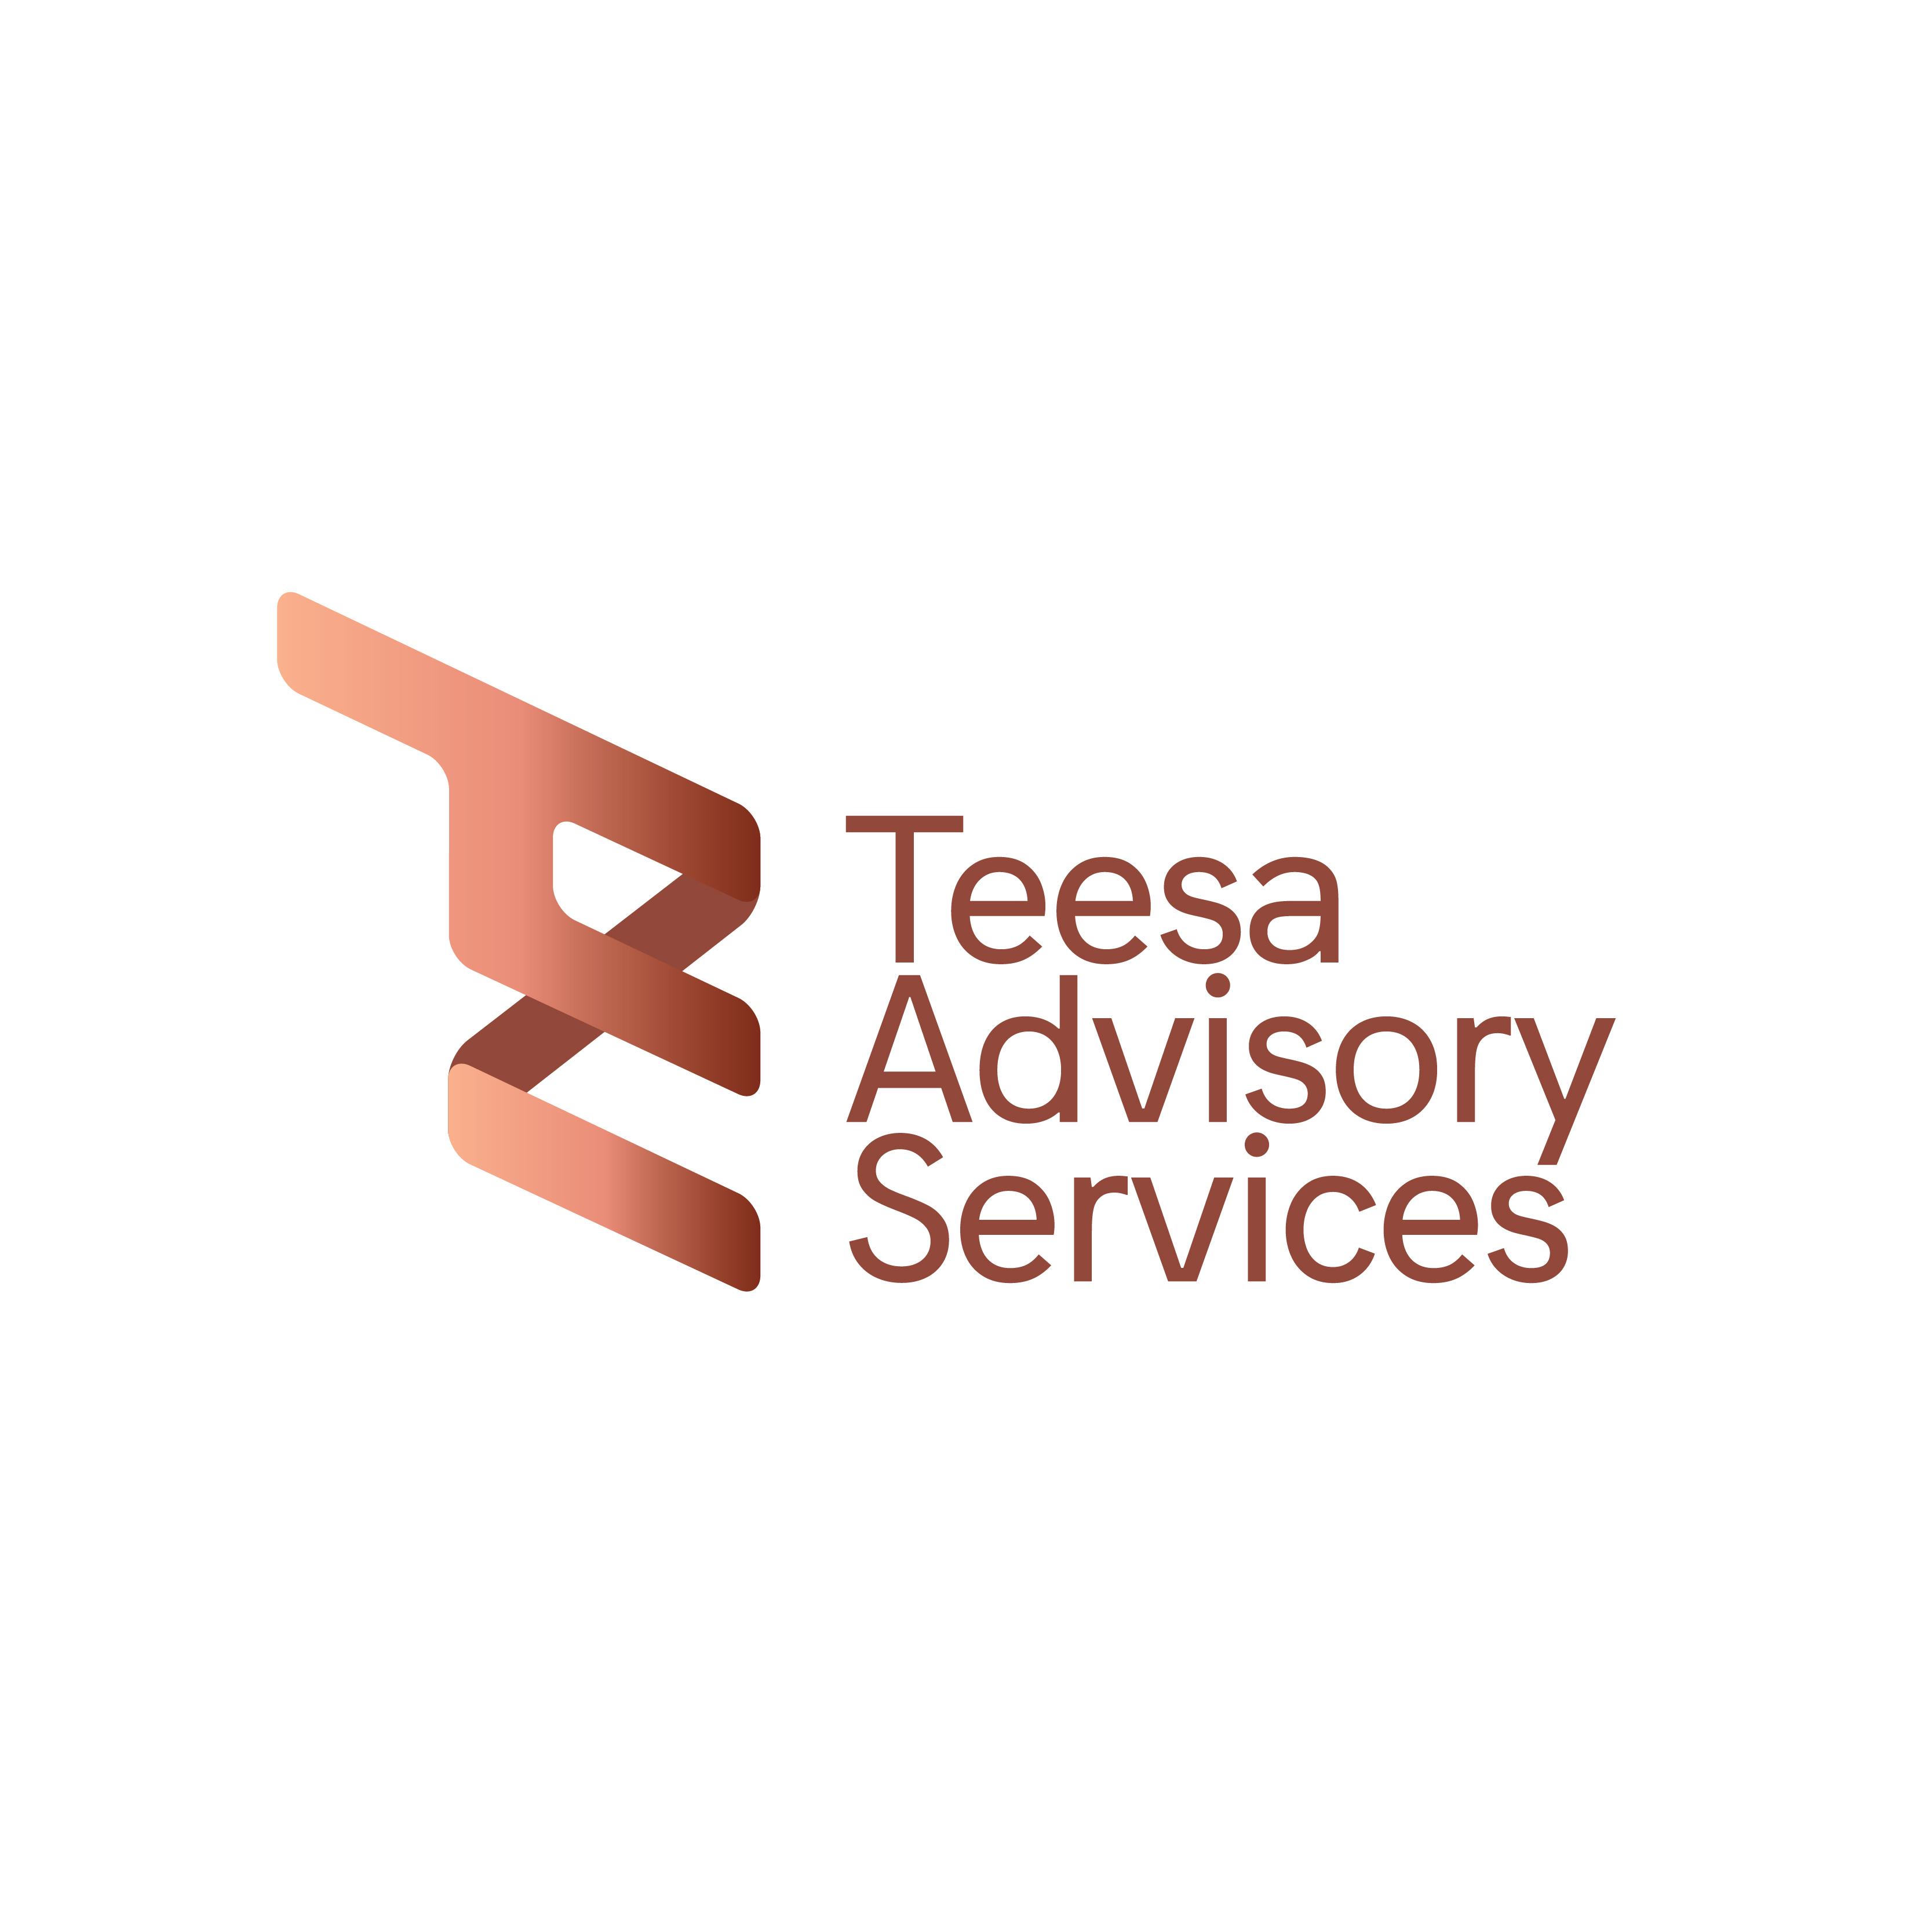 Teesa Advisory Services (U) SMC LTD